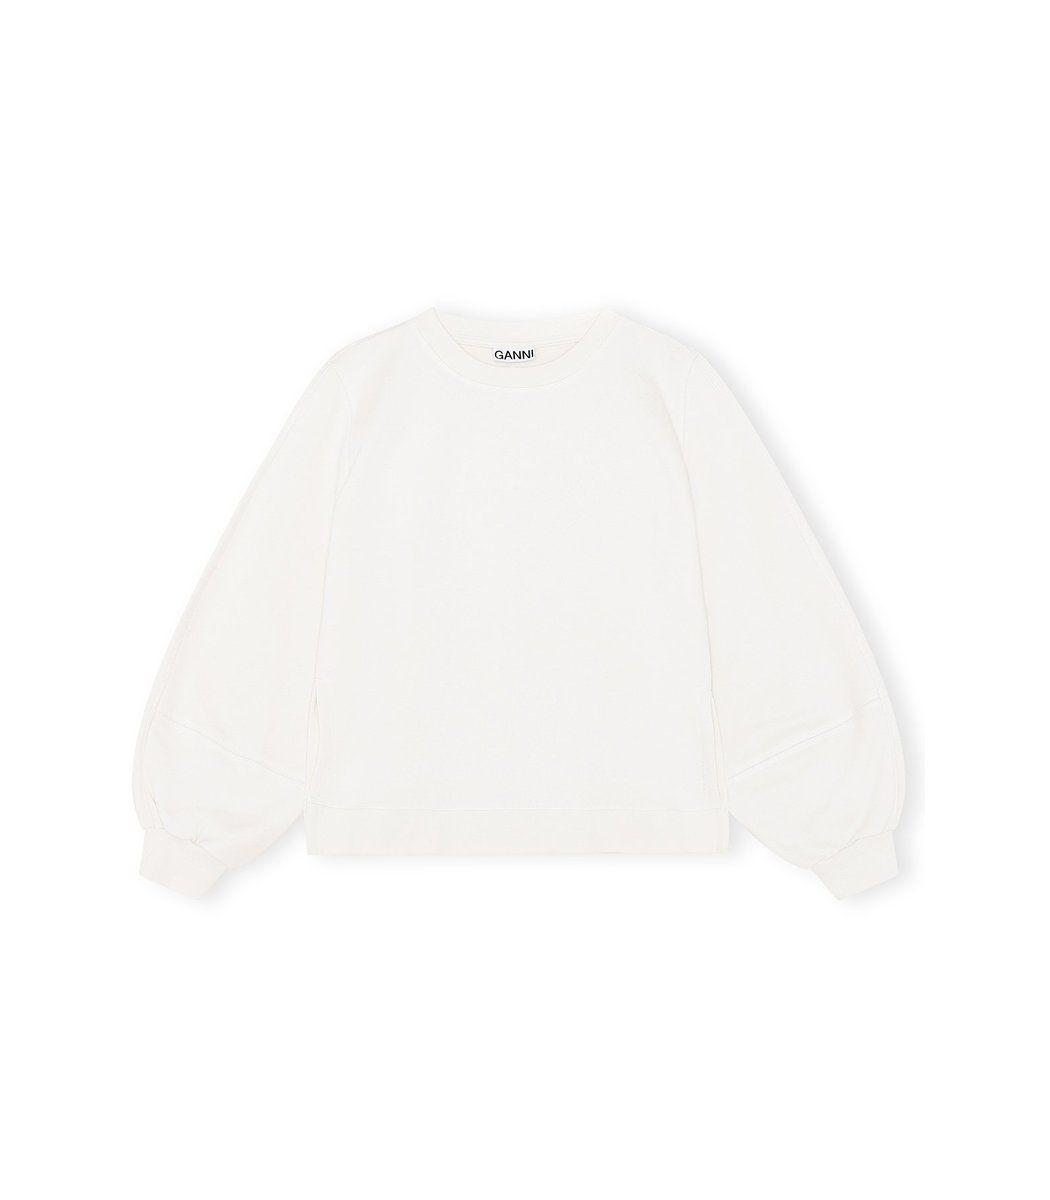 Ganni Software Isoli Sweatshirt In Egret Shopbazaar In 2021 Sweatshirts Sweatshirt Fabric Top Design Fashion [ 1200 x 1050 Pixel ]